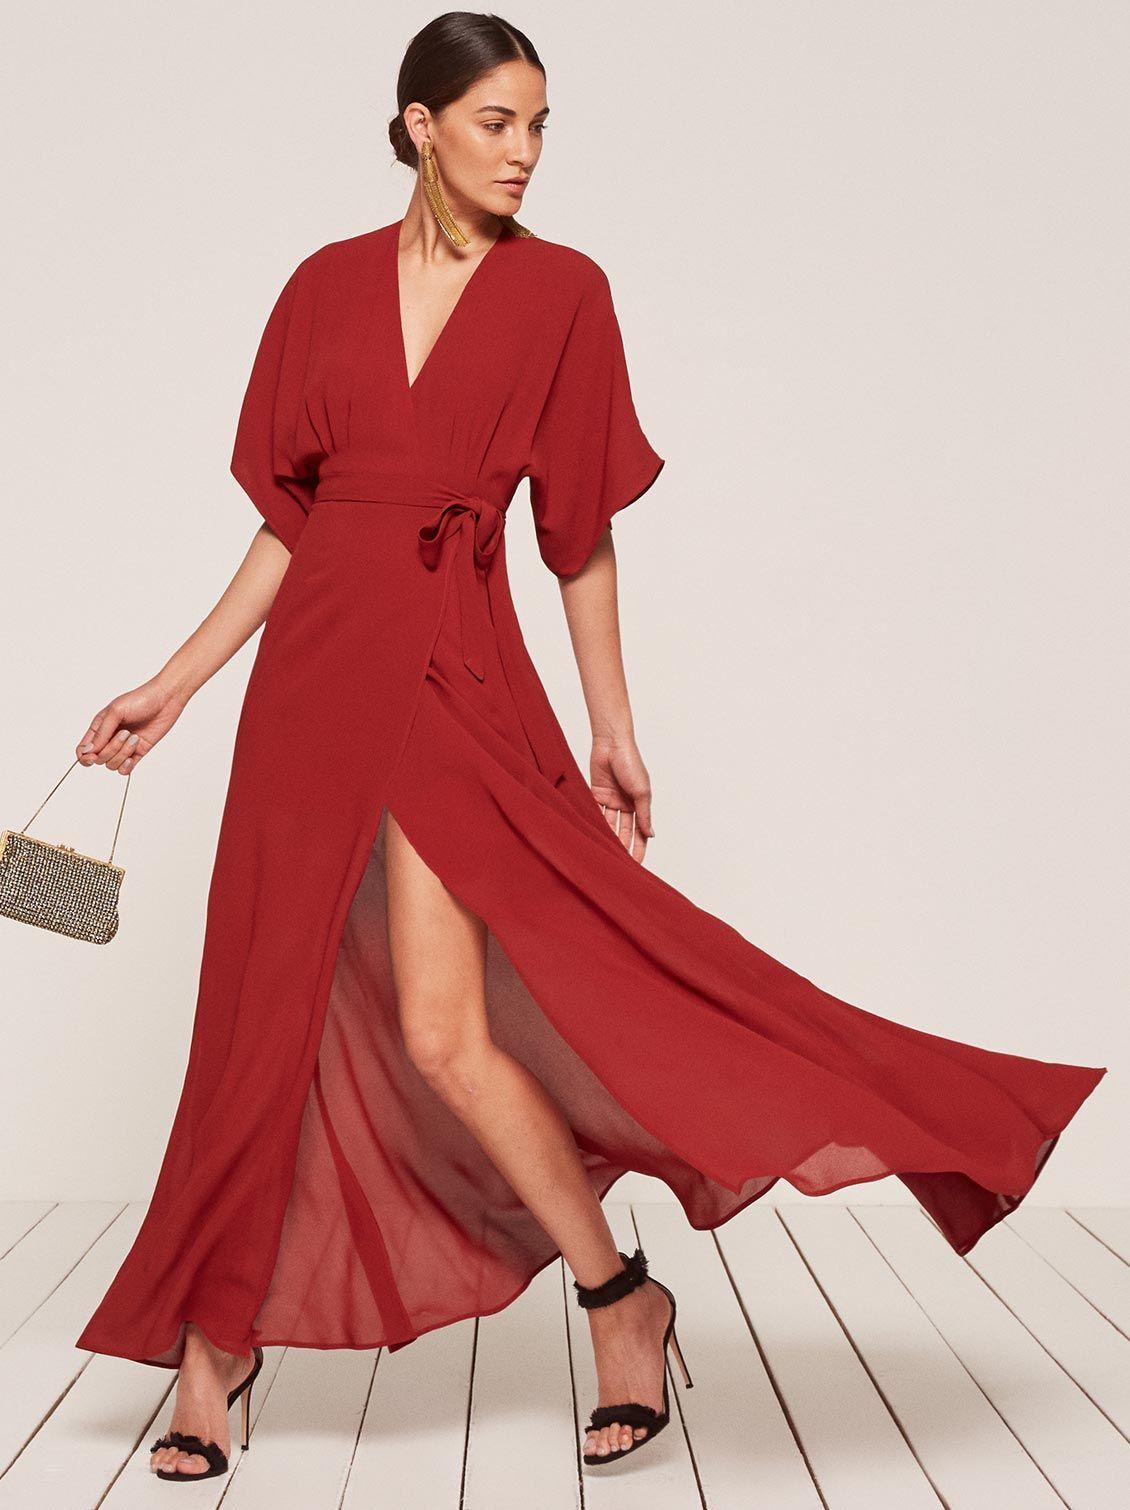 Winslow dress cranberry 1 clp | Rent designer dresses ...